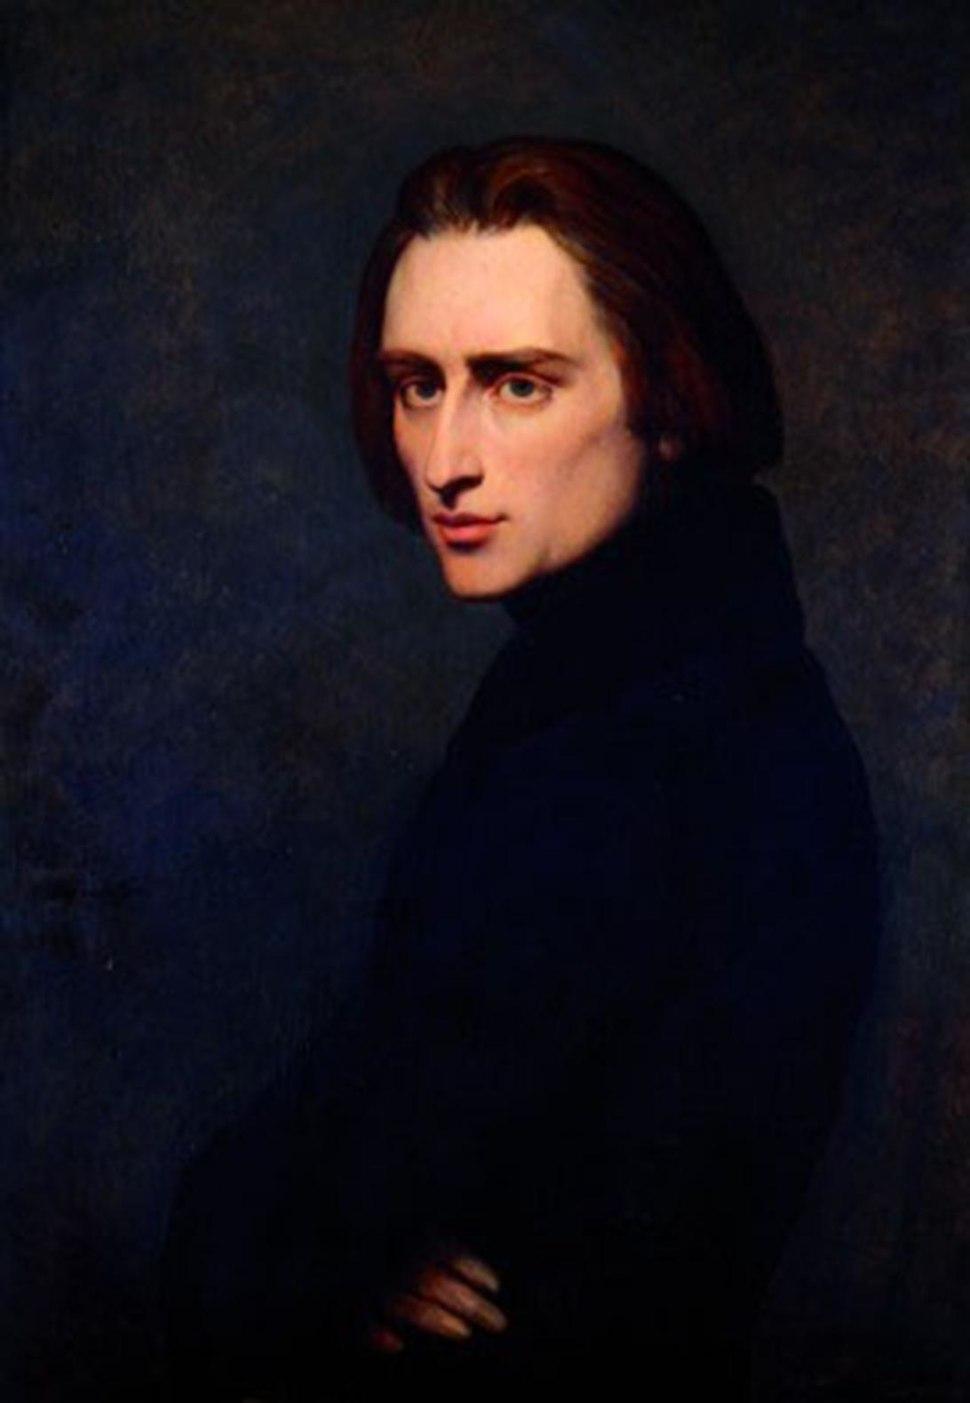 Ary Scheffer - Franz Liszt